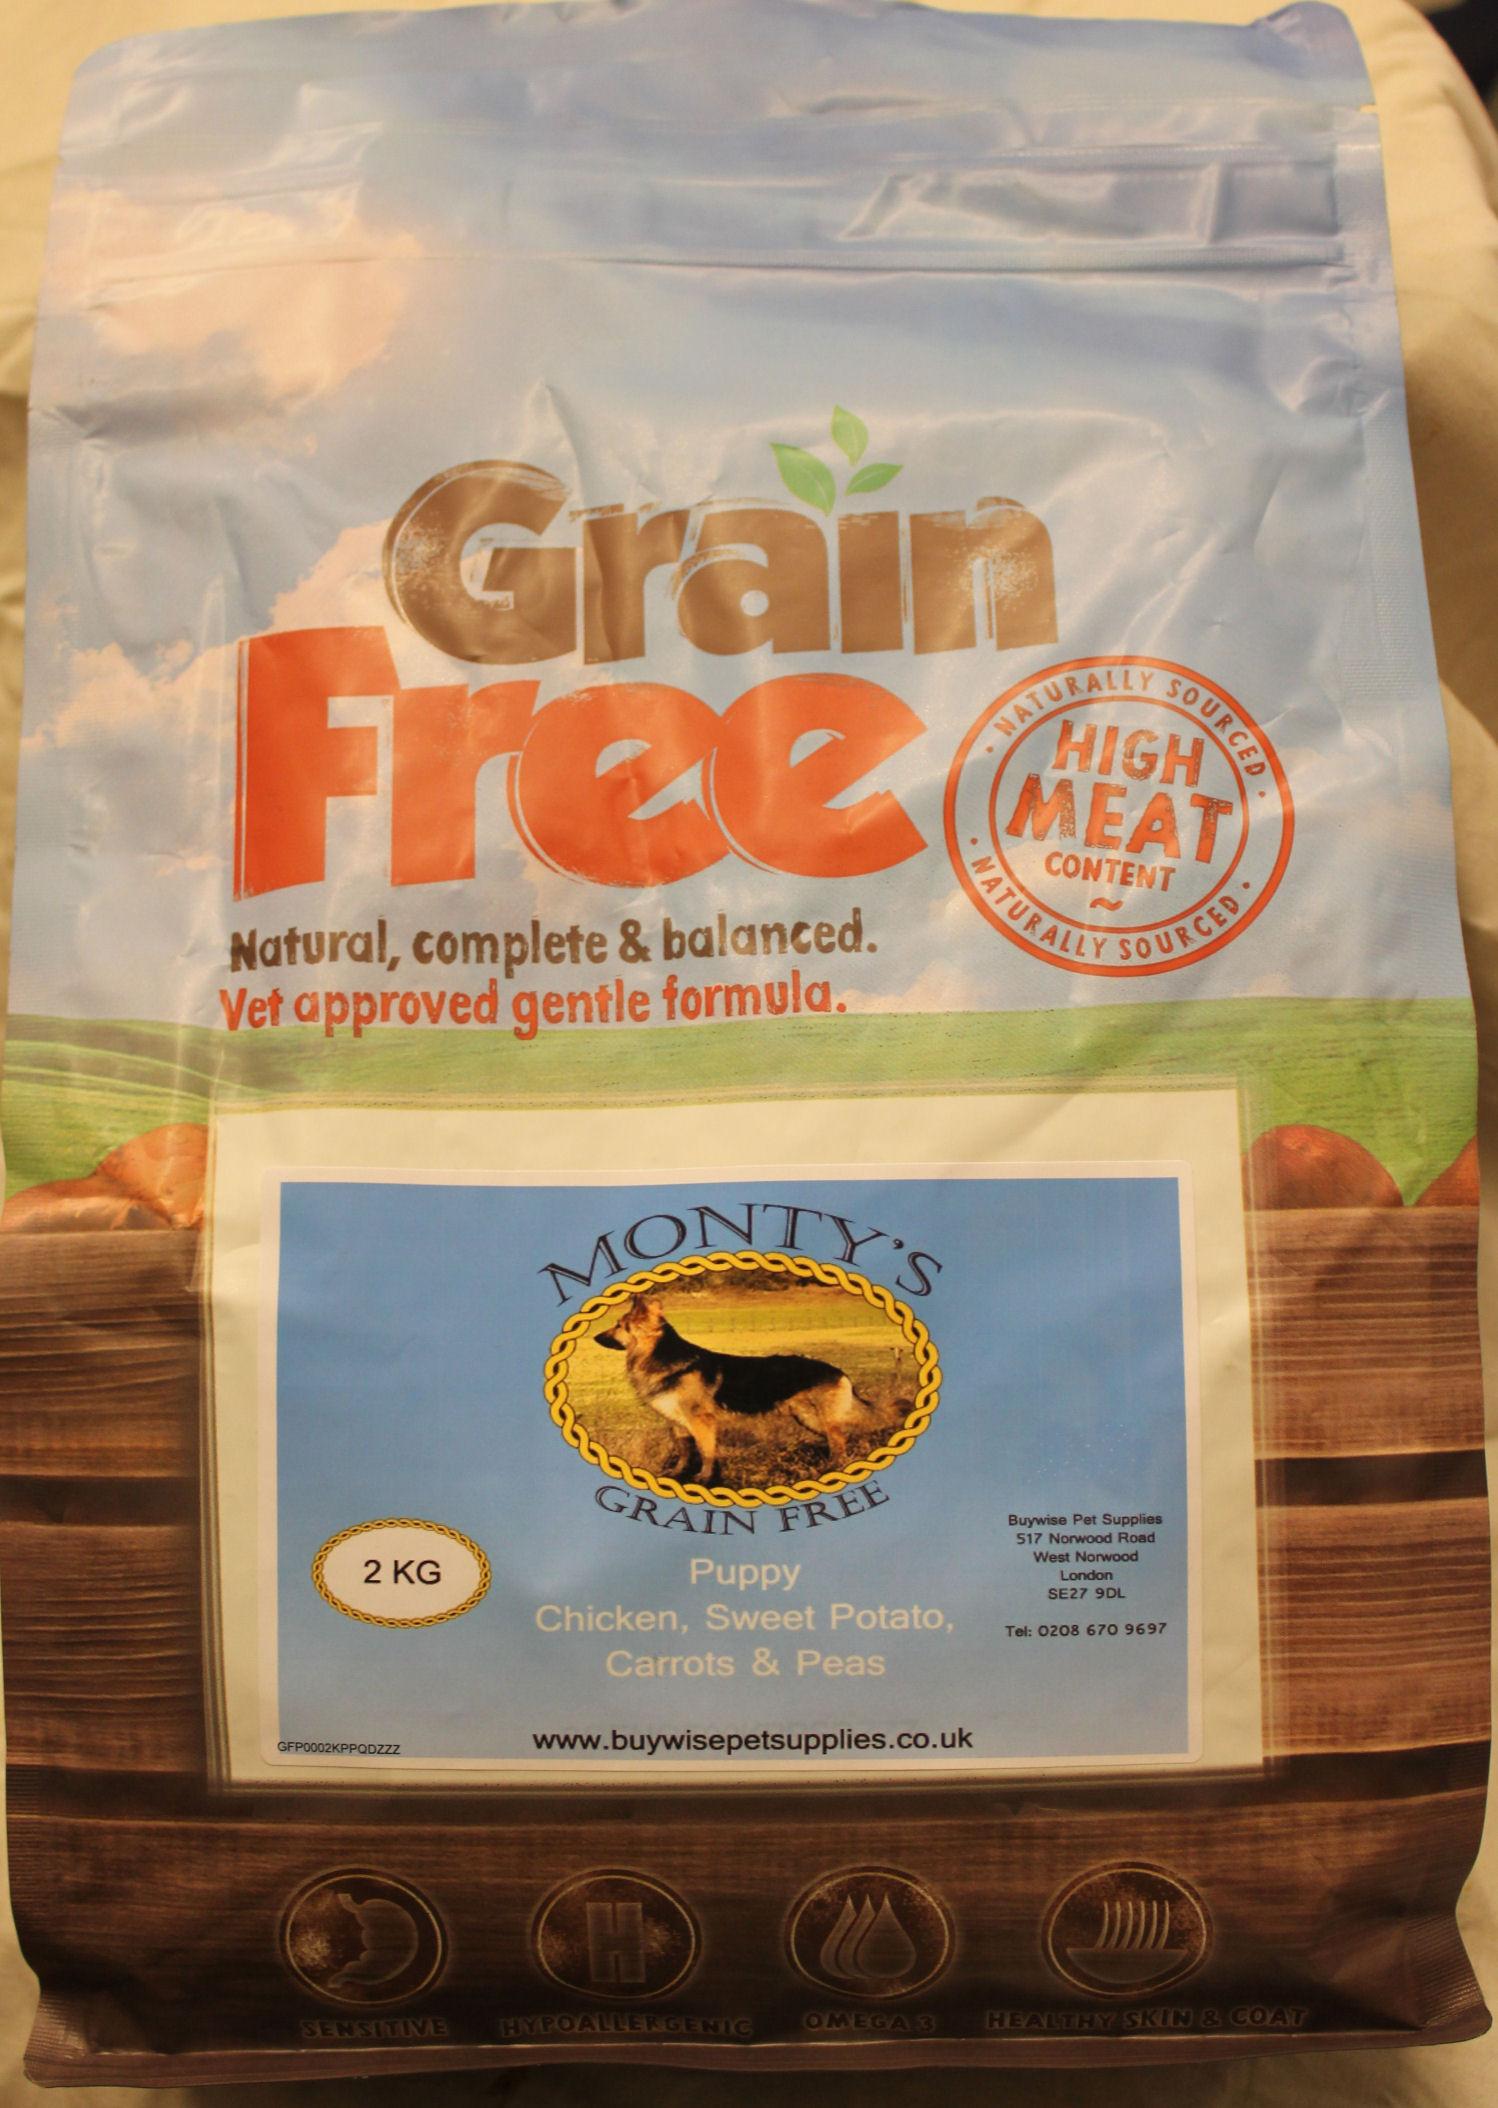 Montys Grain Free Puppy Chicken with Sweet Potato, Carrots & Peas 2kg